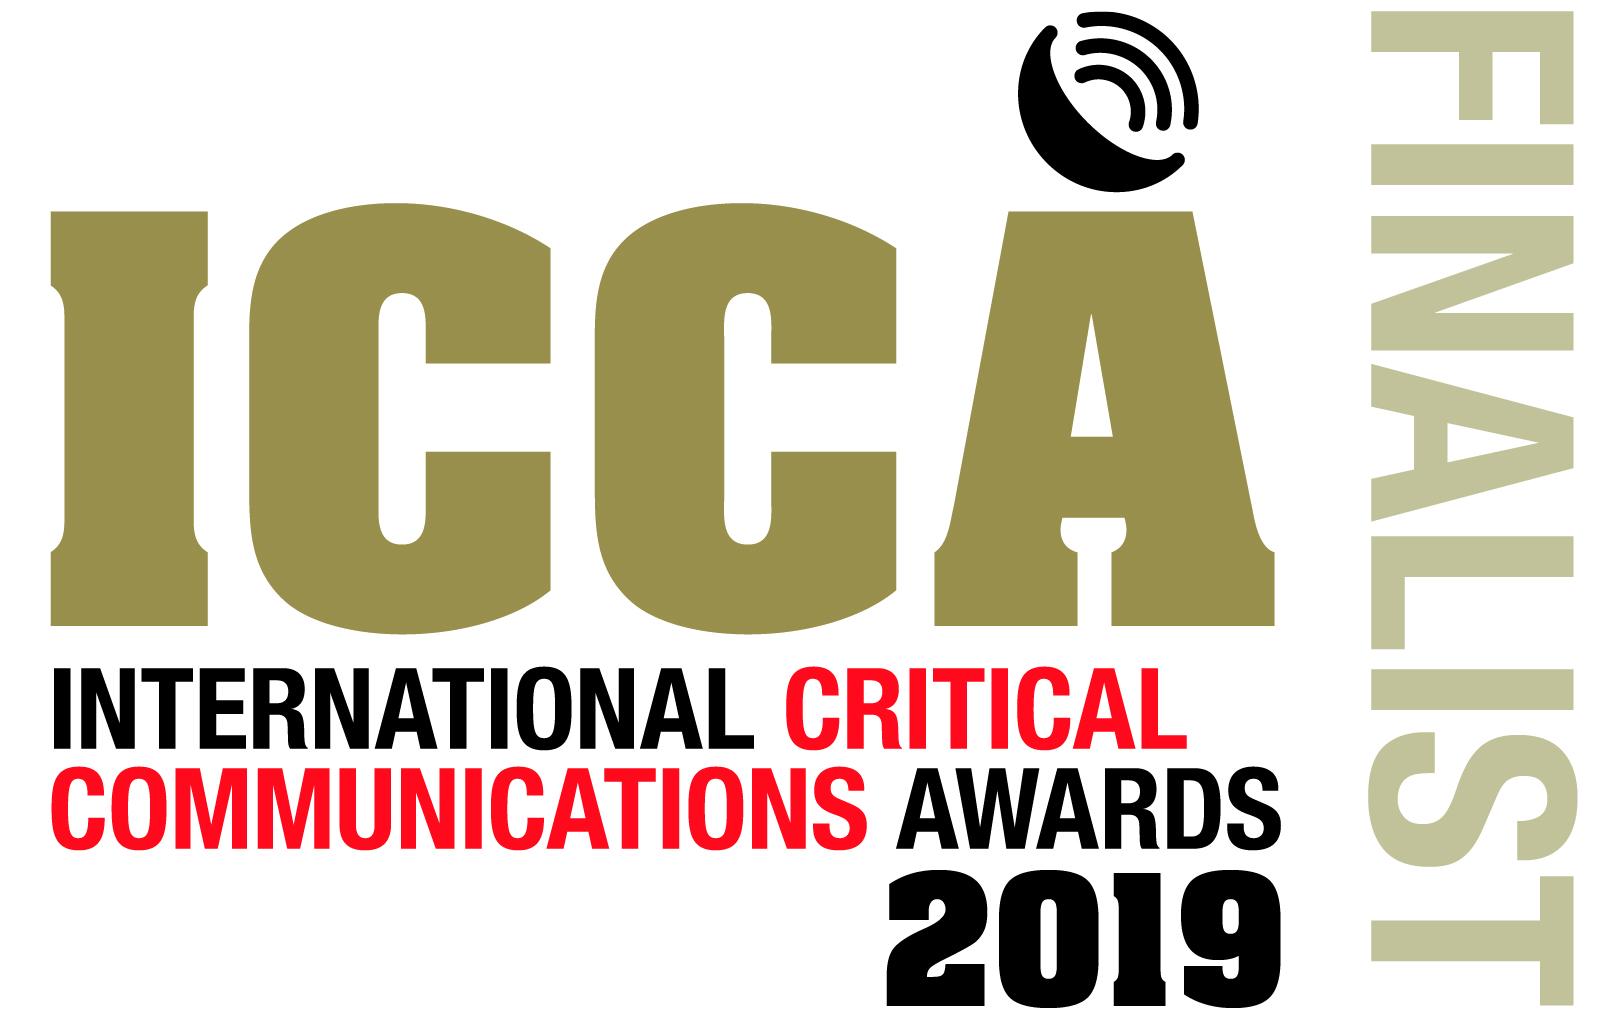 ICCA_2019_Finalist_cmyk-01.jpg